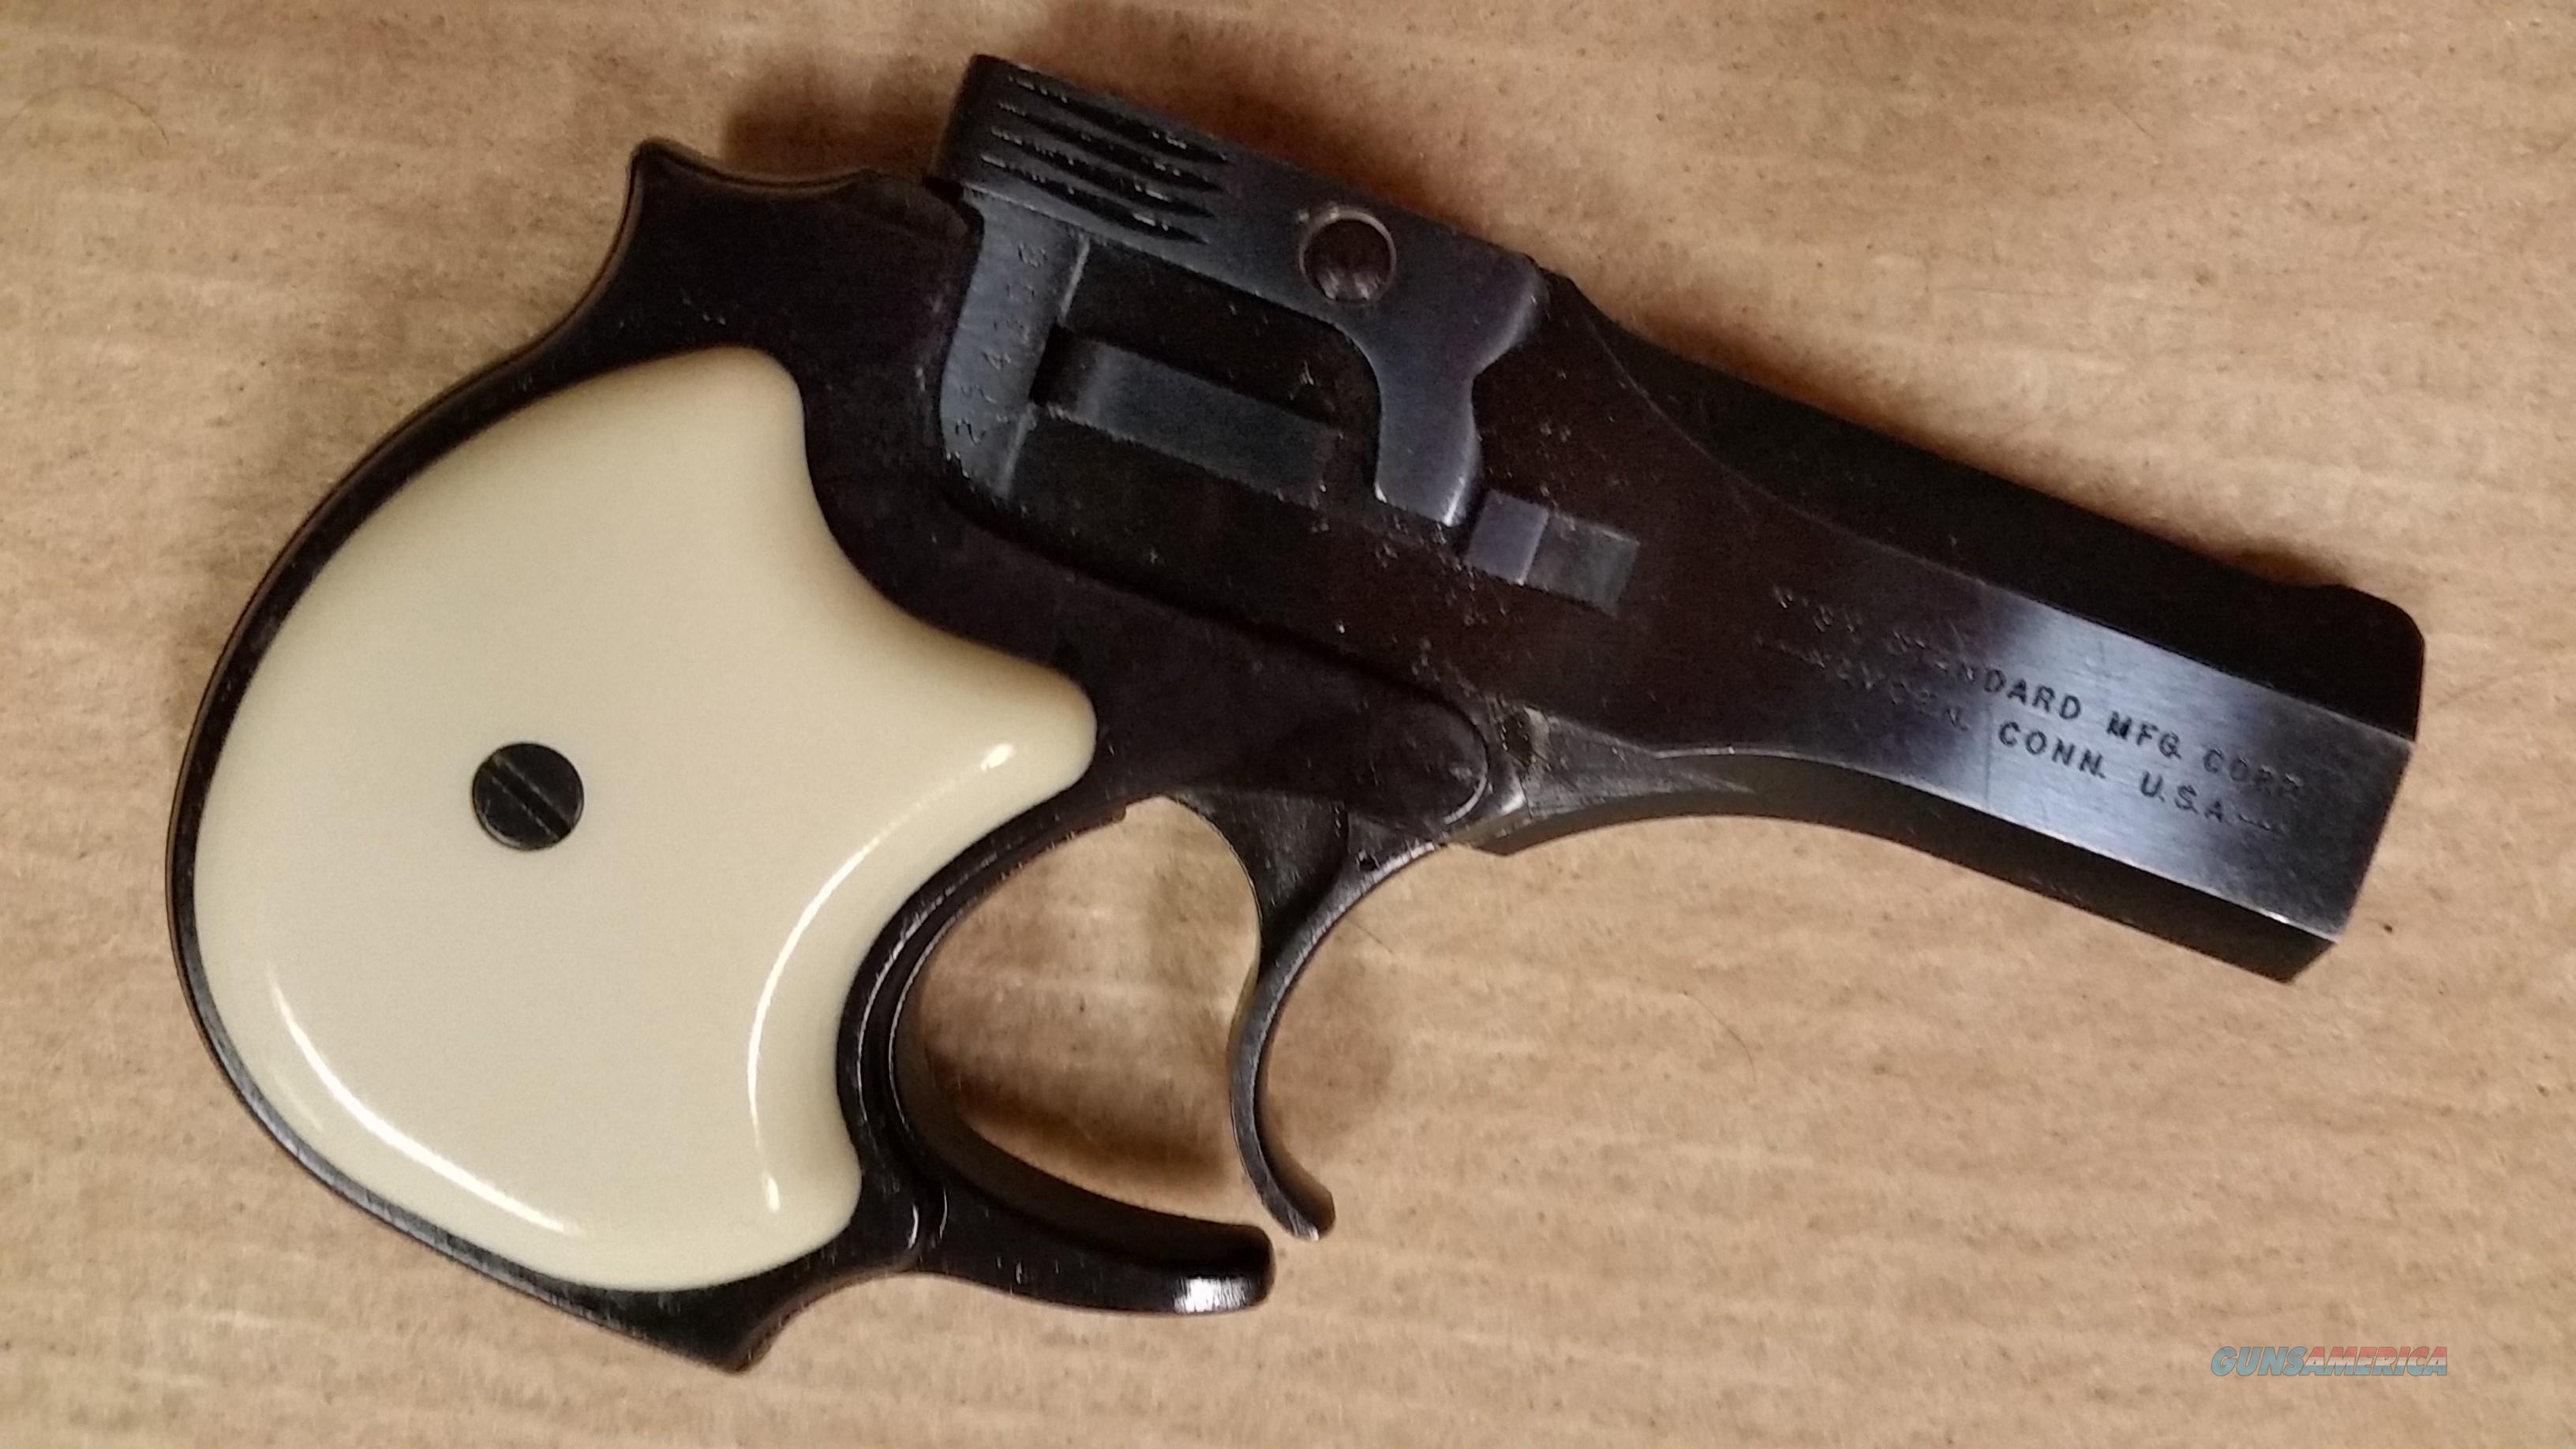 High Standard Derringer, Model D-101 in 22 LR  Guns > Pistols > High Standard Pistols